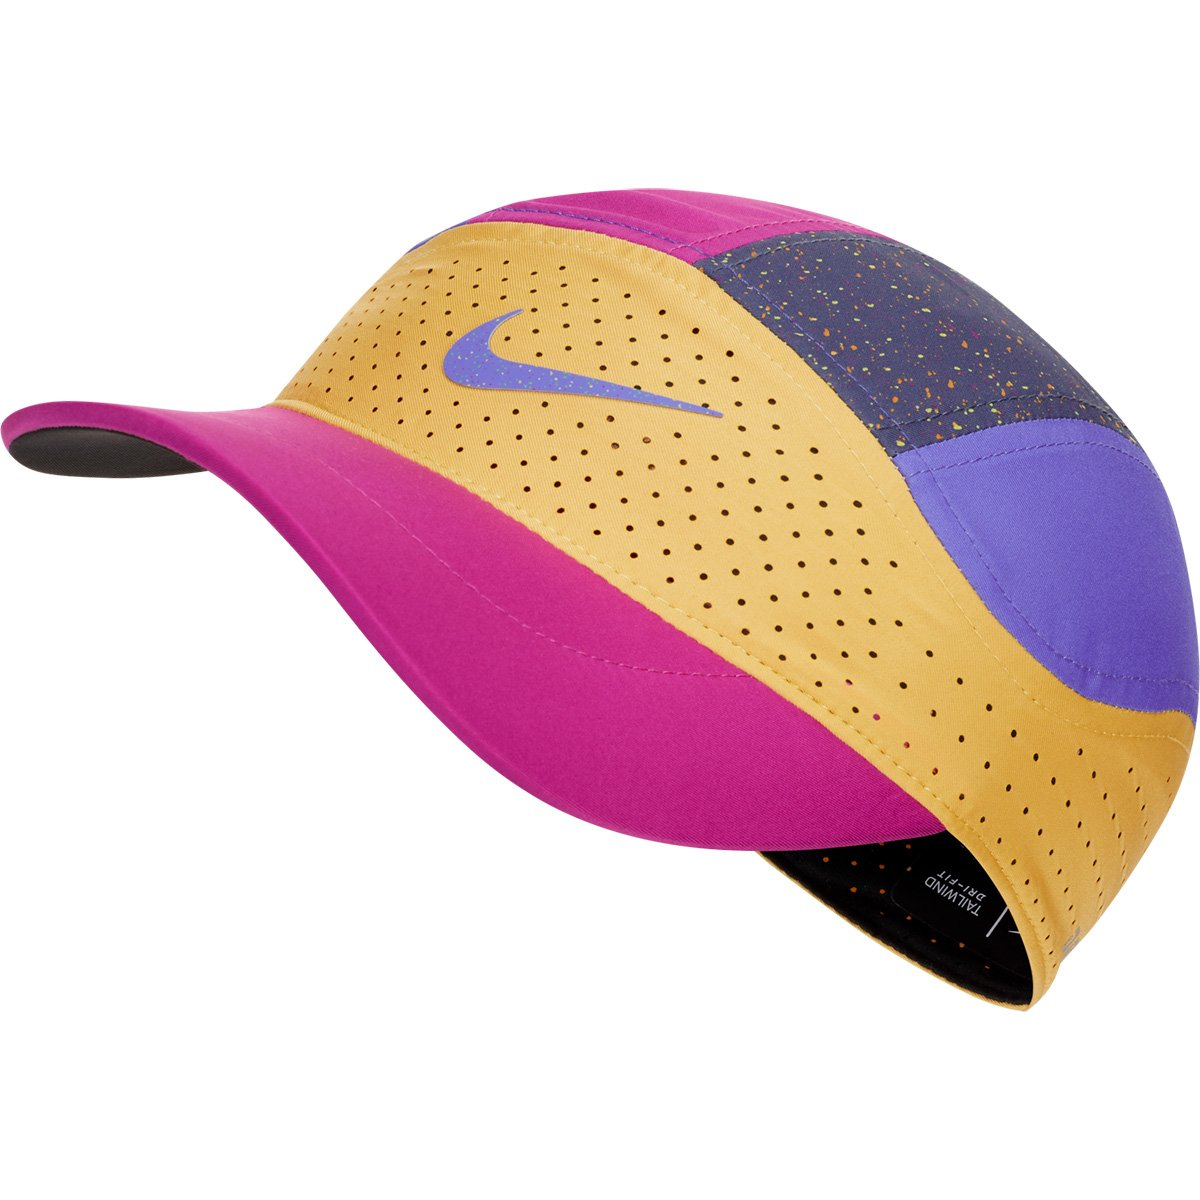 Imagem - Boné Nike Dri-fit Aerobill Tailwind Esportivo